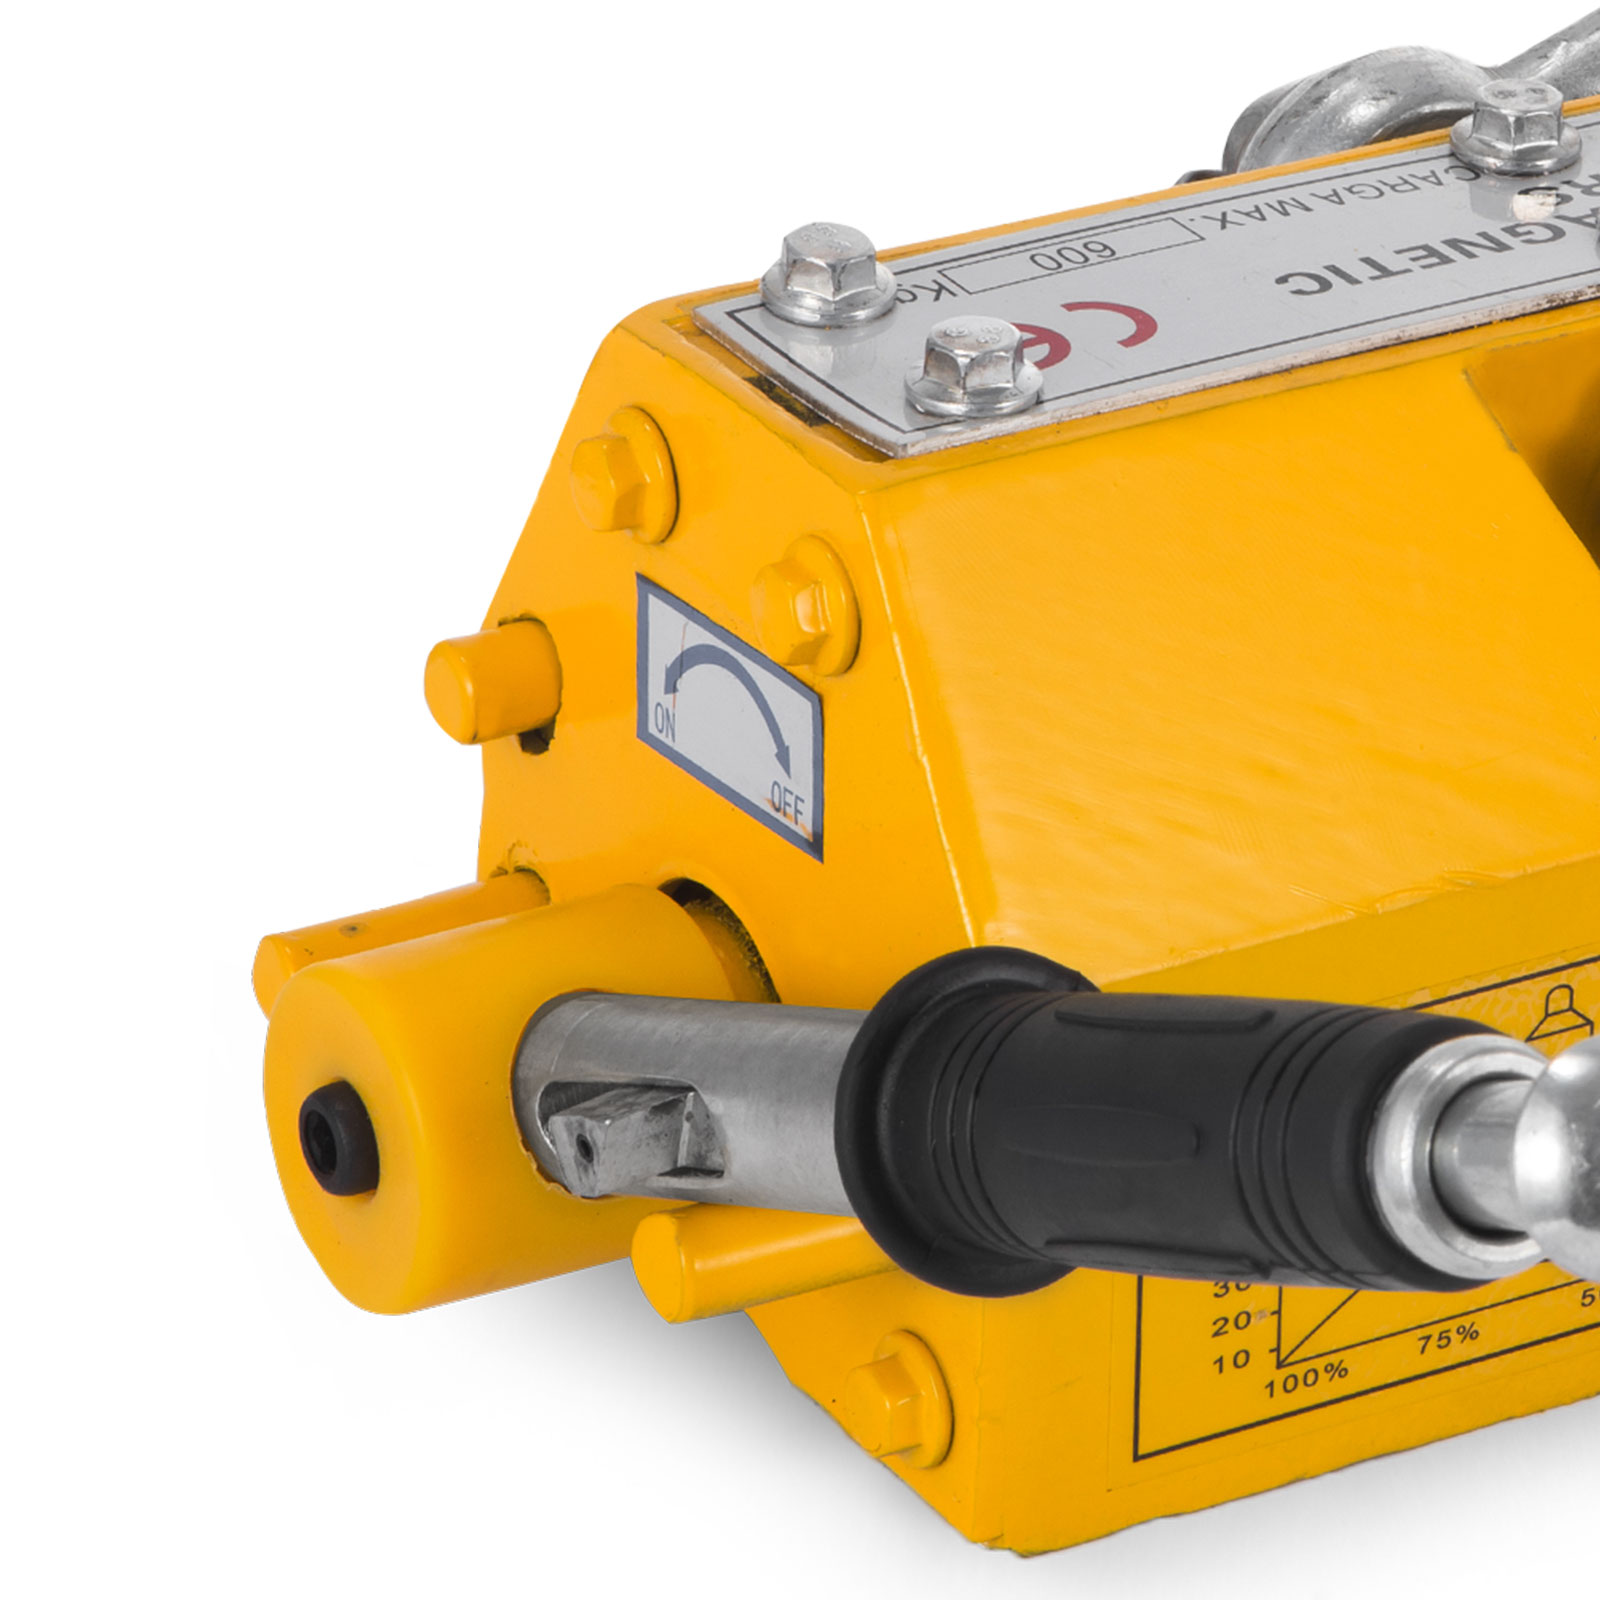 100-300-600-1000KG-Steel-Magnetic-Lifter-Heavy-Duty-Crane-Hoist-Lifting-Magnet miniature 60